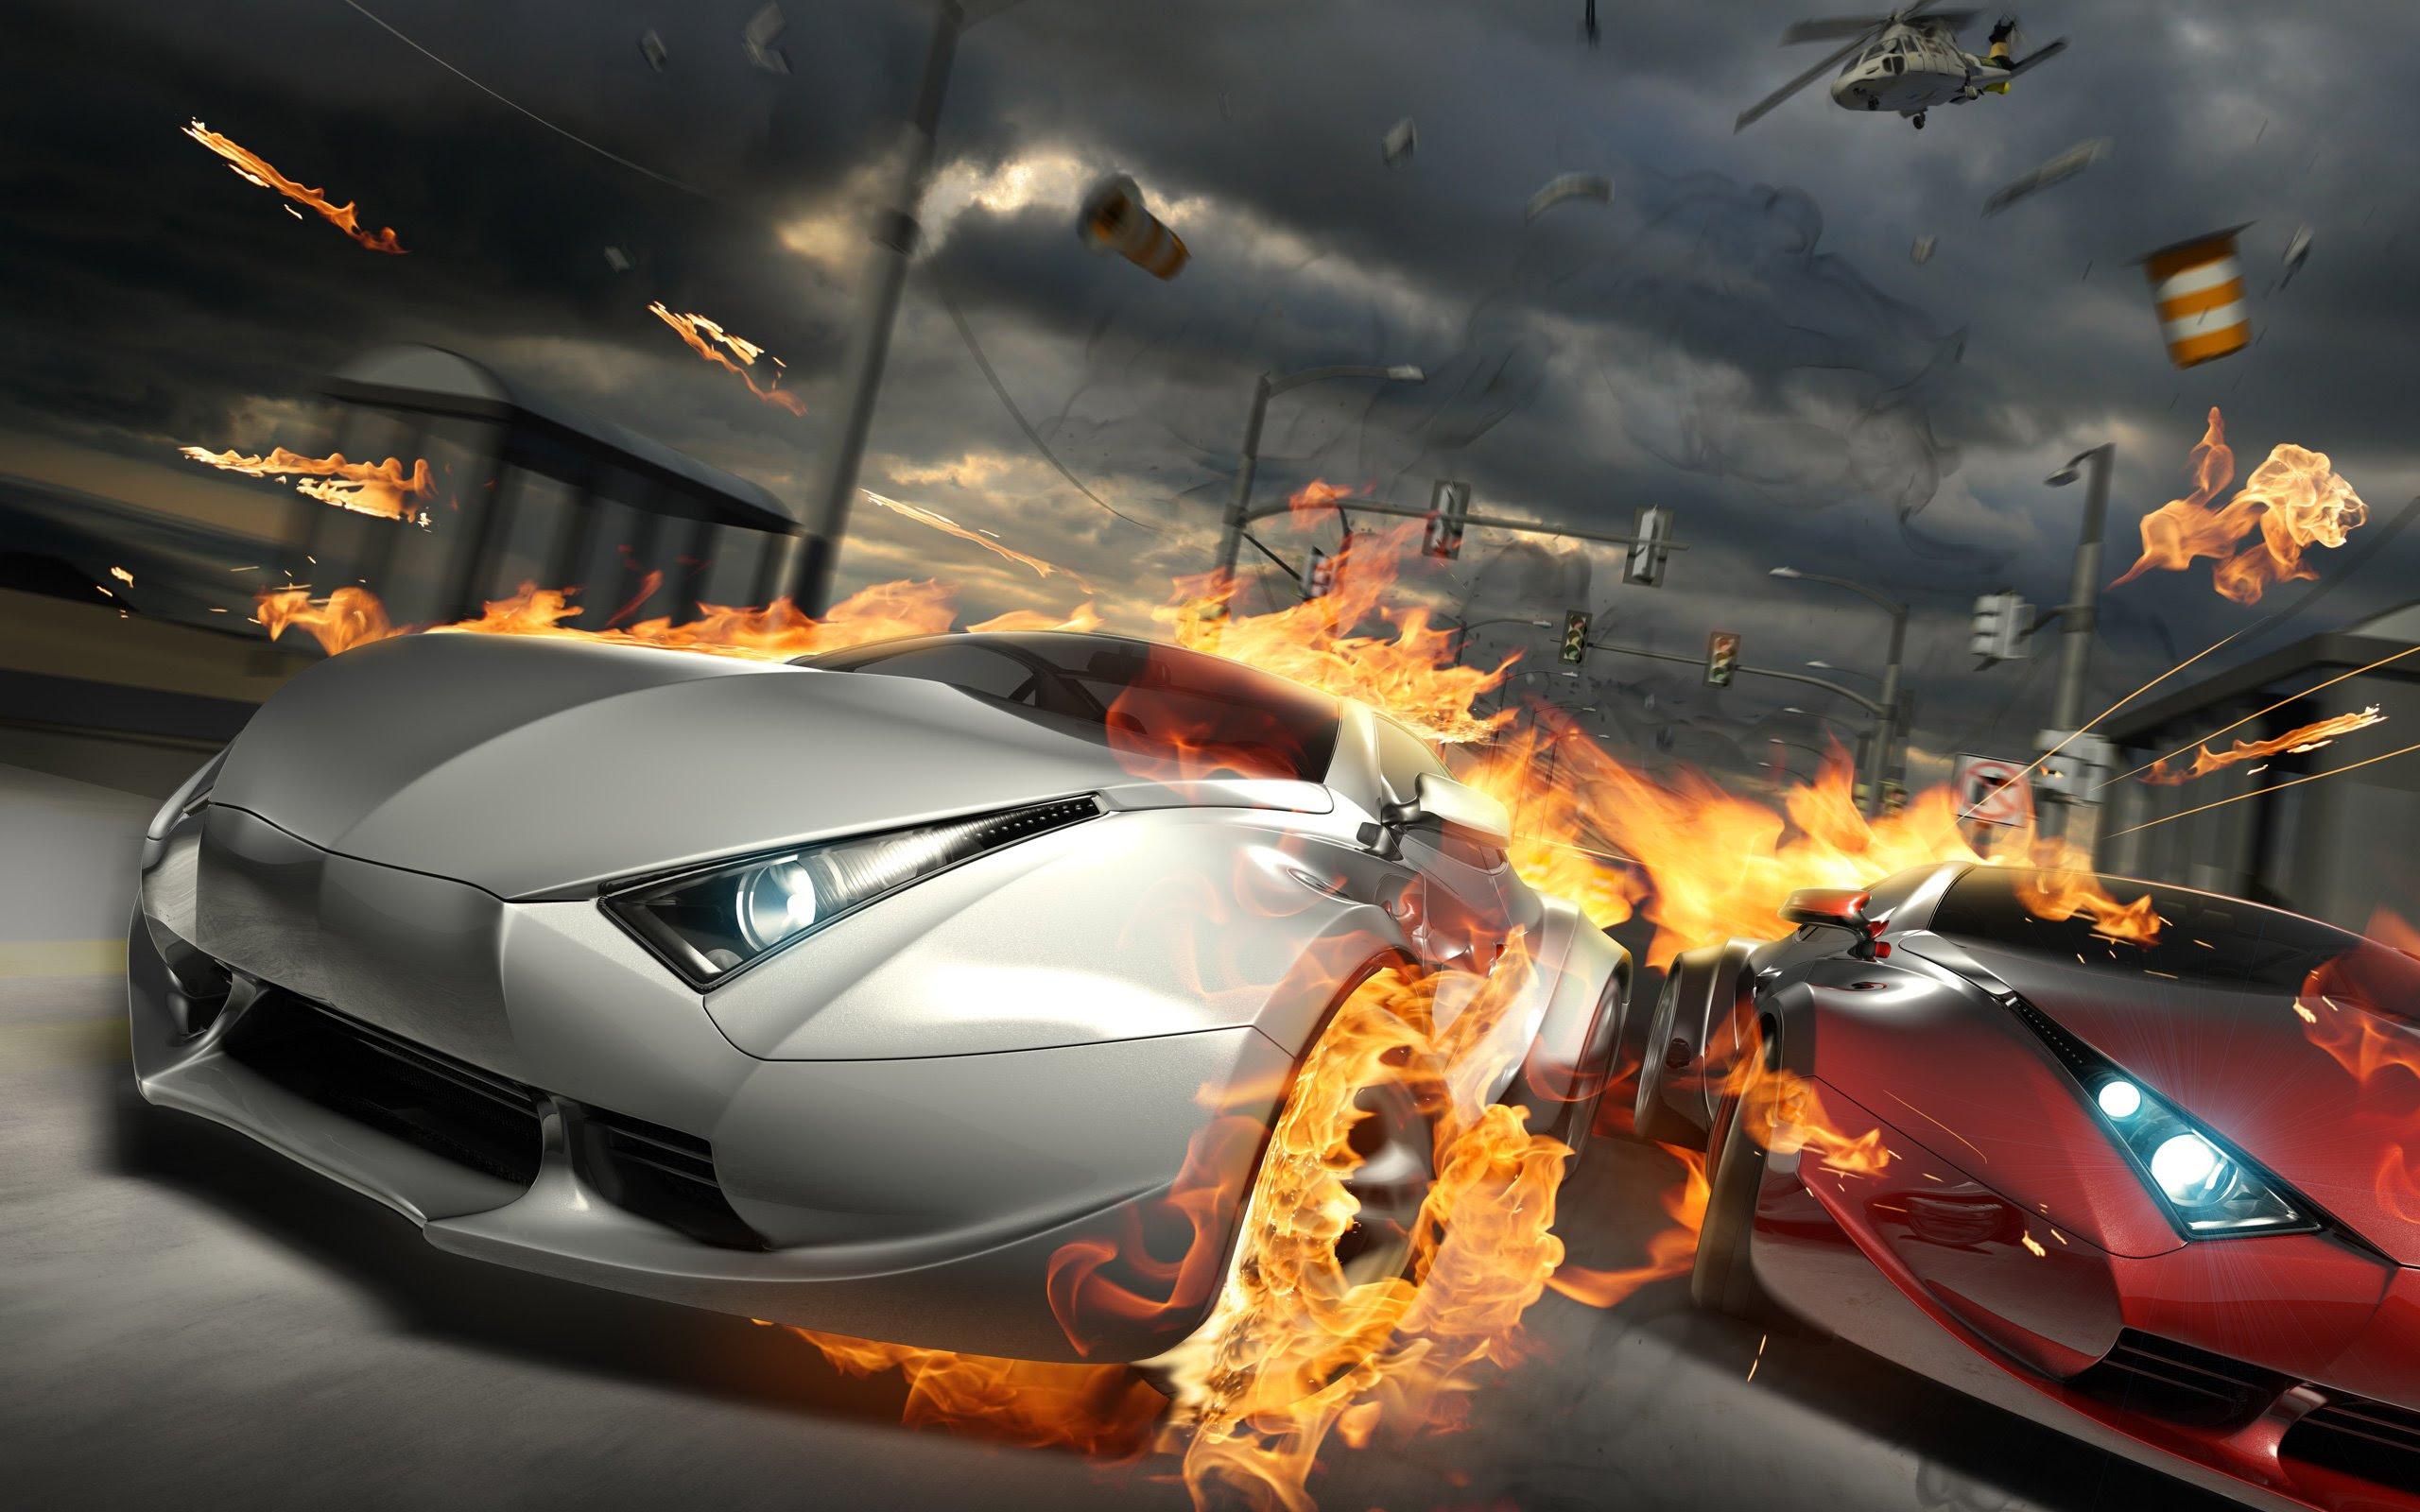 Destructive Car Race Wallpapers  HD Wallpapers  ID 8695